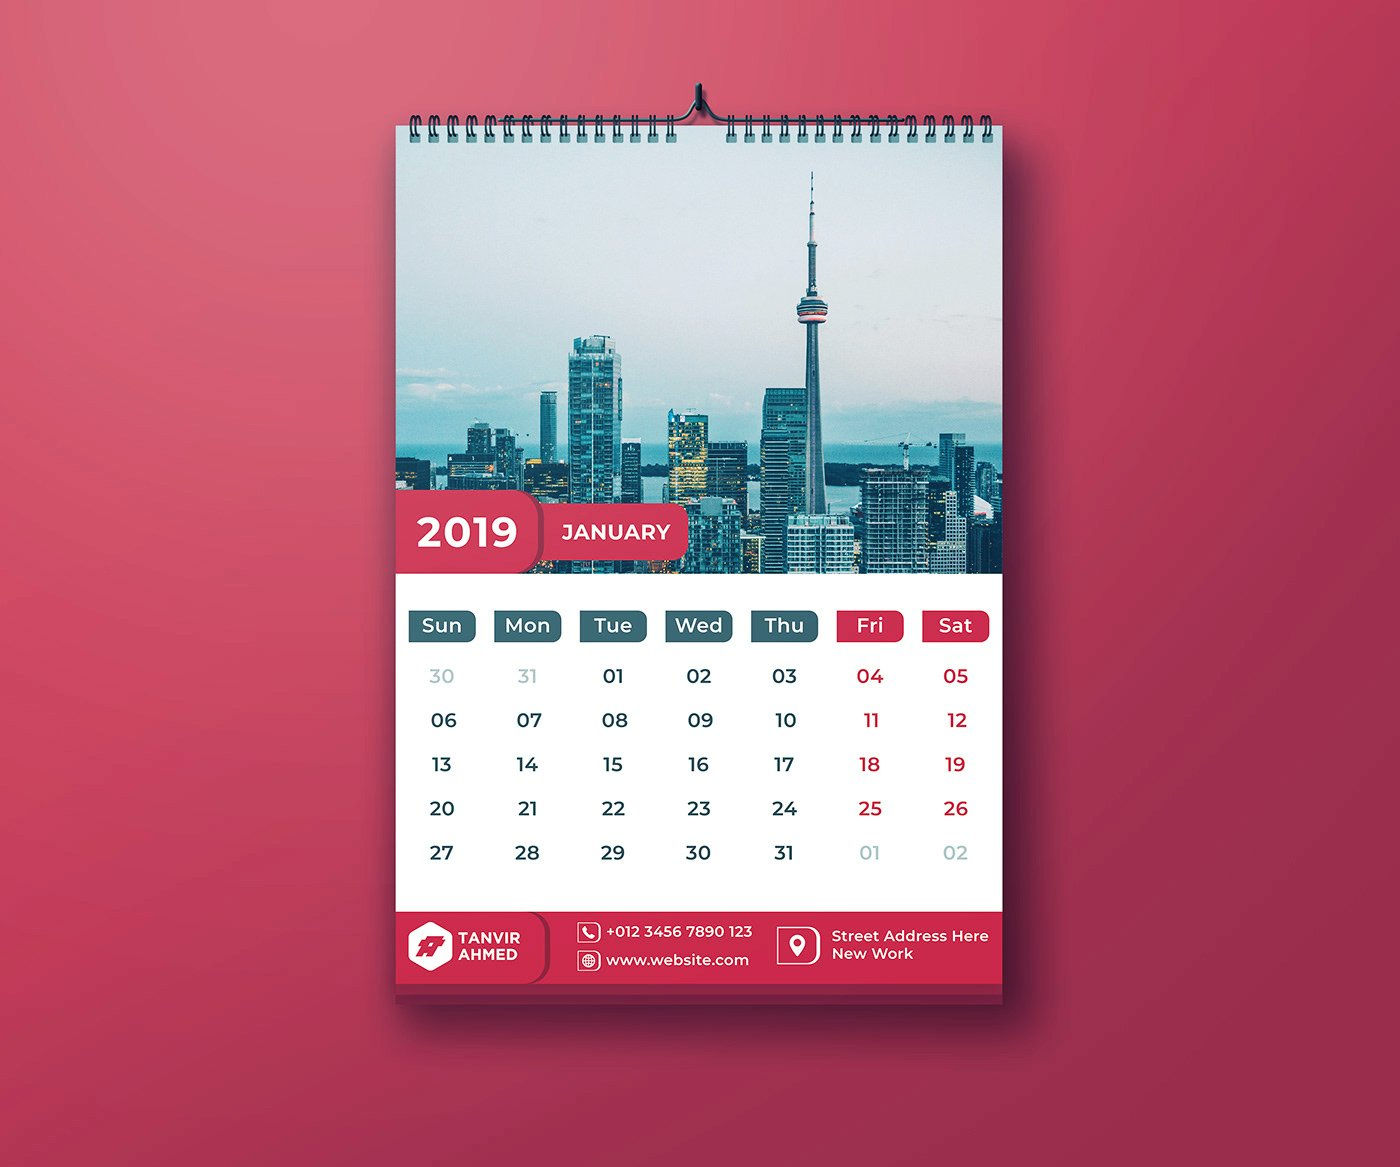 Wall Calendar 2019 | Free Psd Template | Psd Repo Calendar 2019 Template Psd